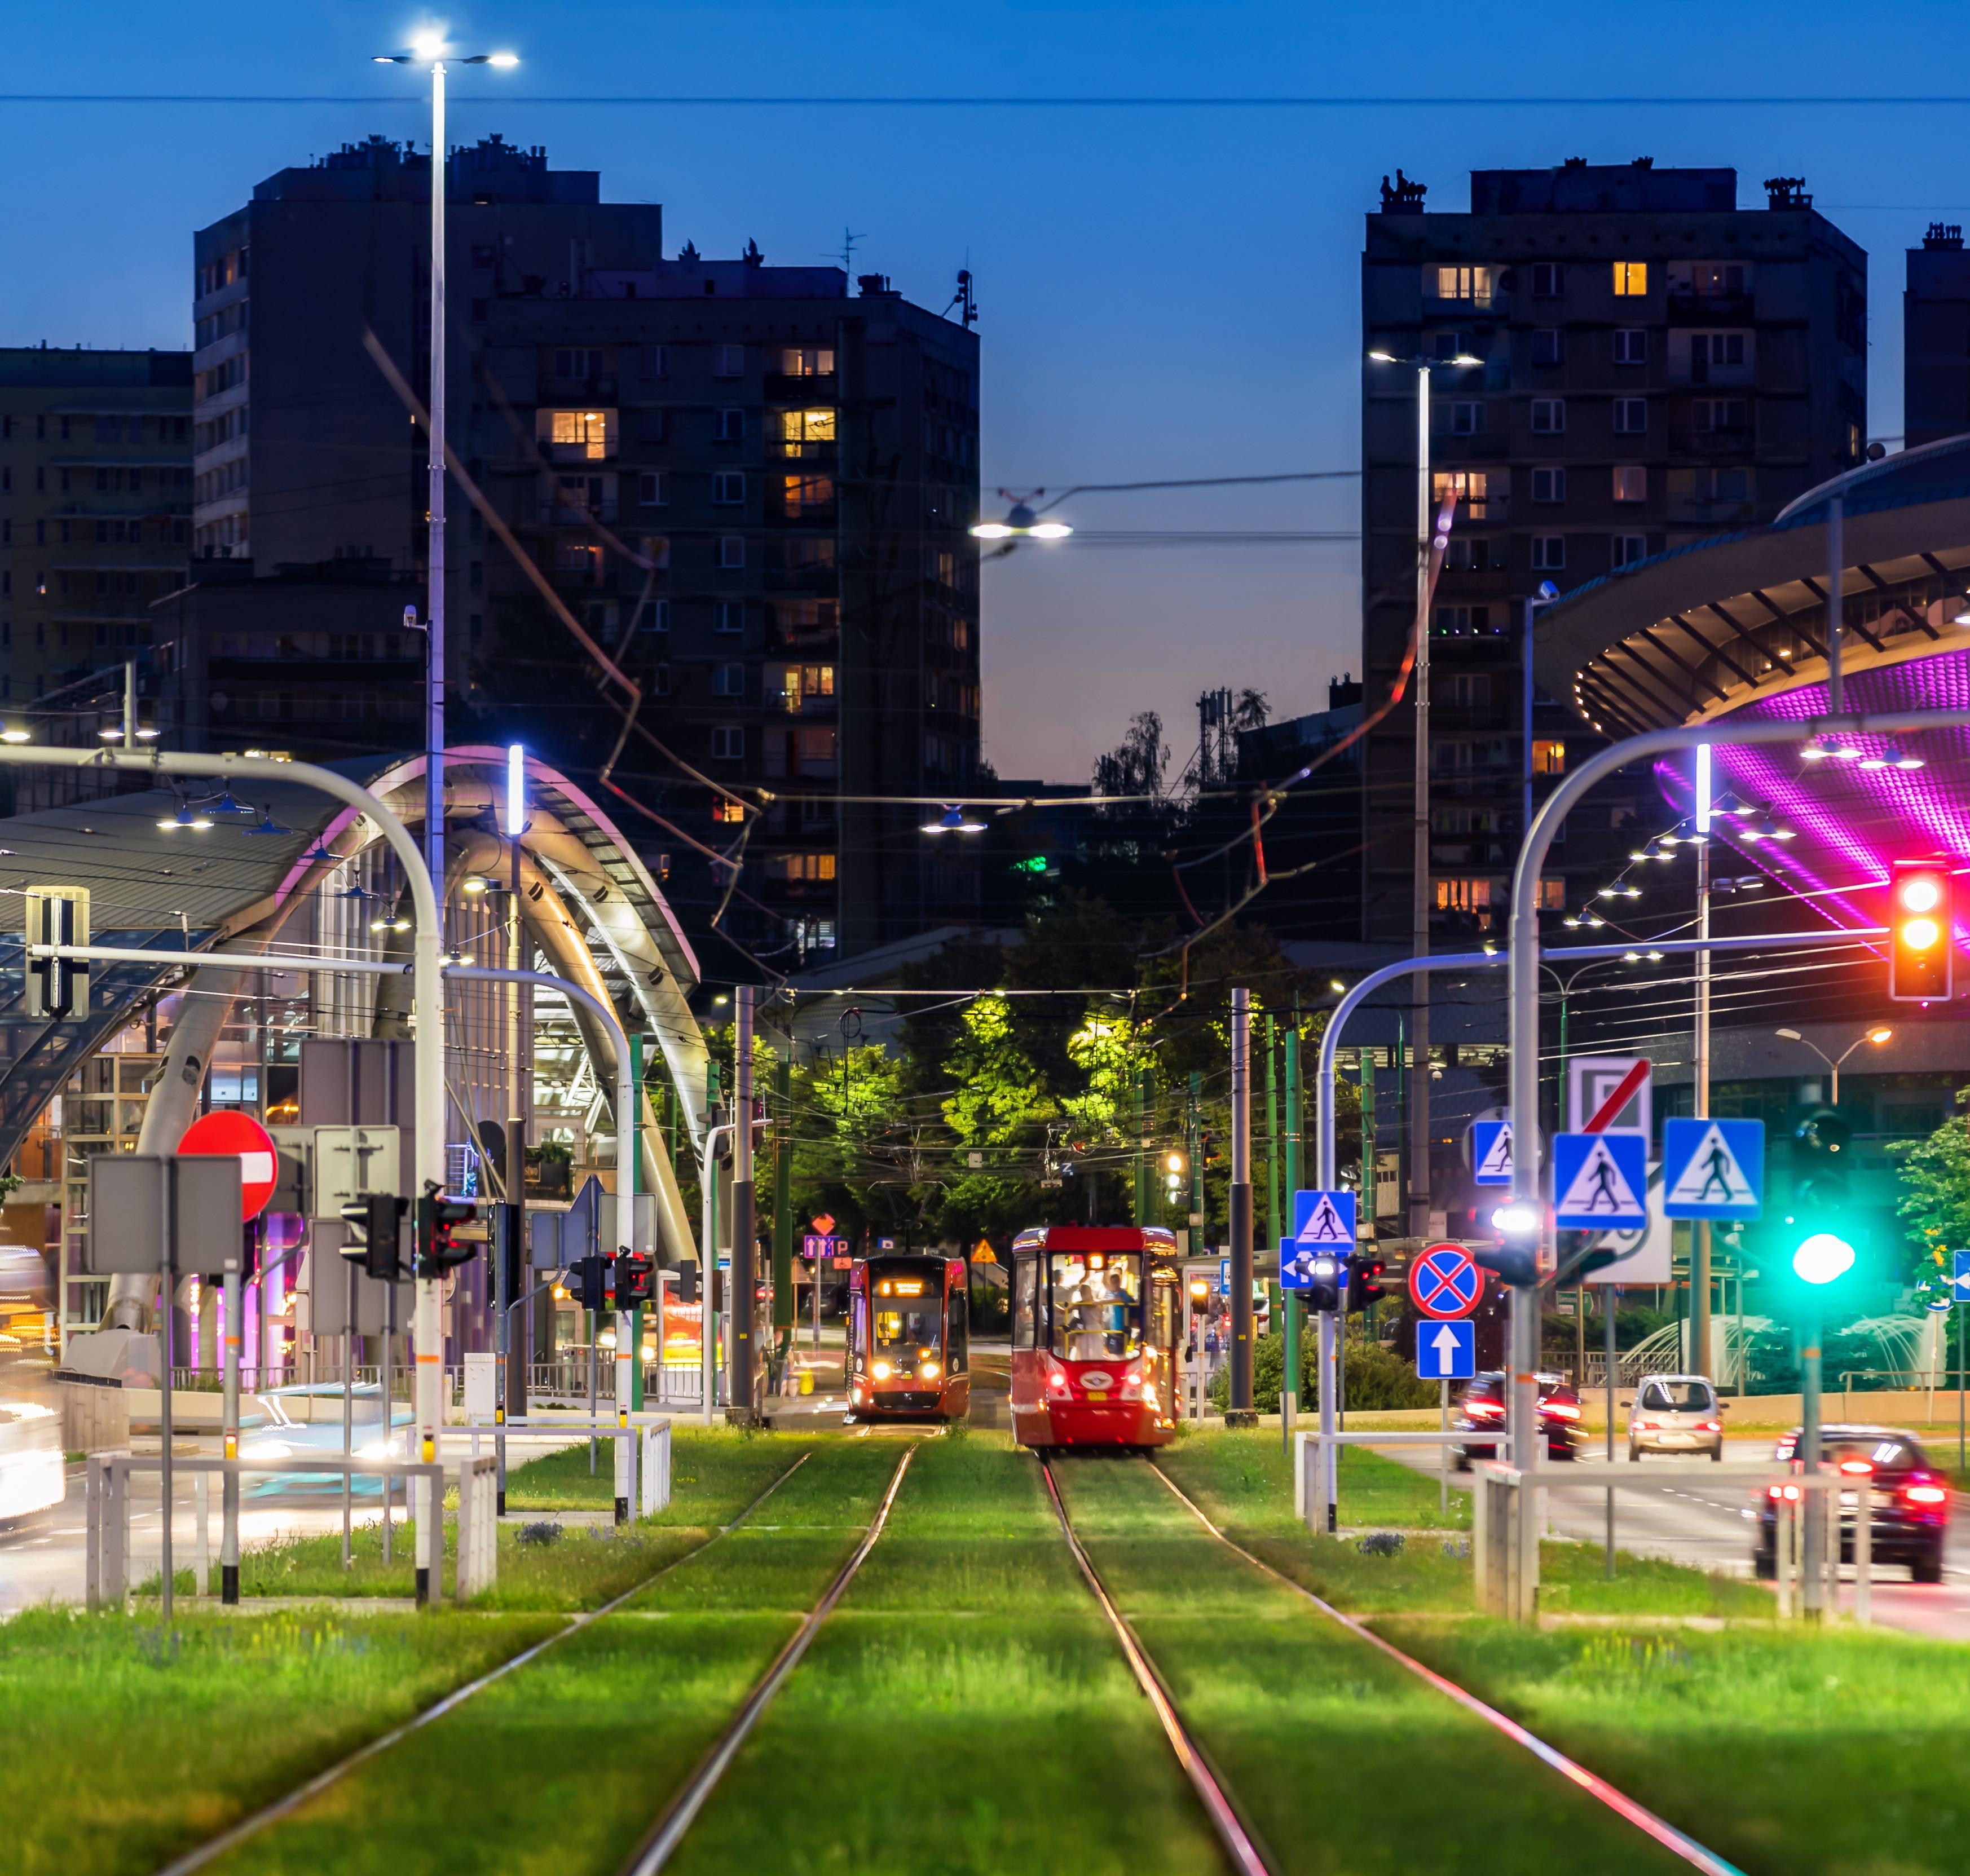 city-traffic-at-night-2